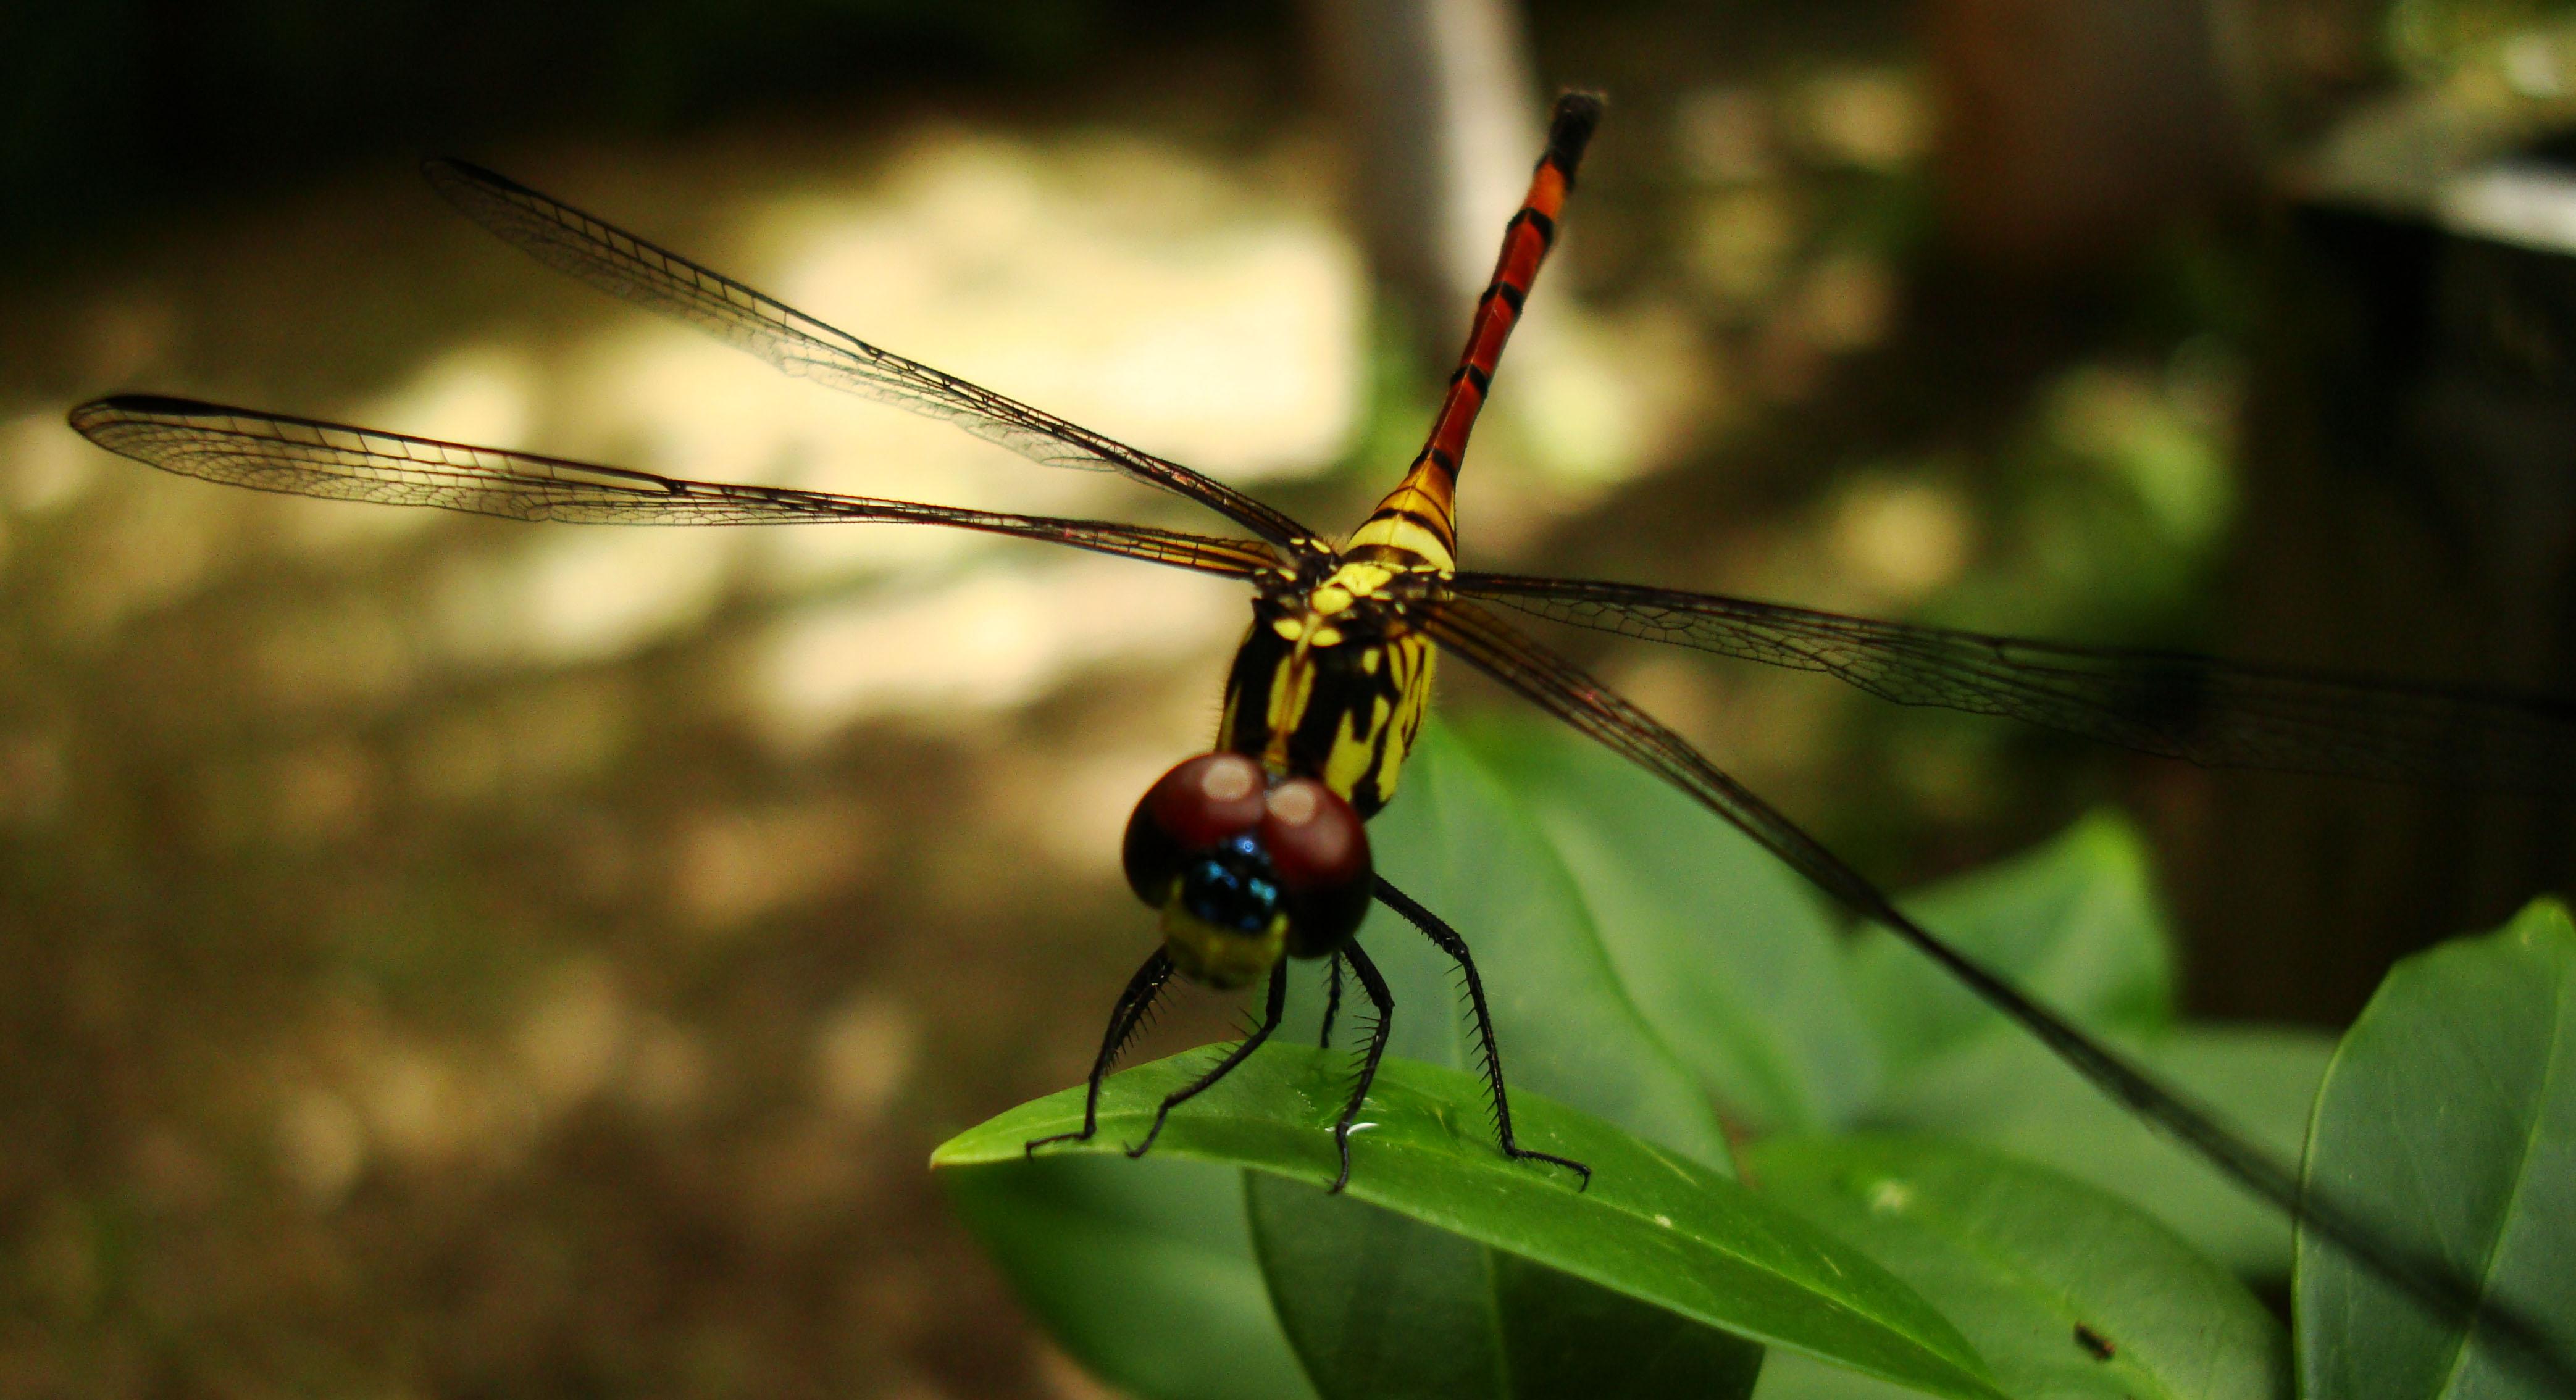 Libellulidae Red Swampdragon Agrionoptera insignis allogenes Sunshine Coast Qld Australia 119